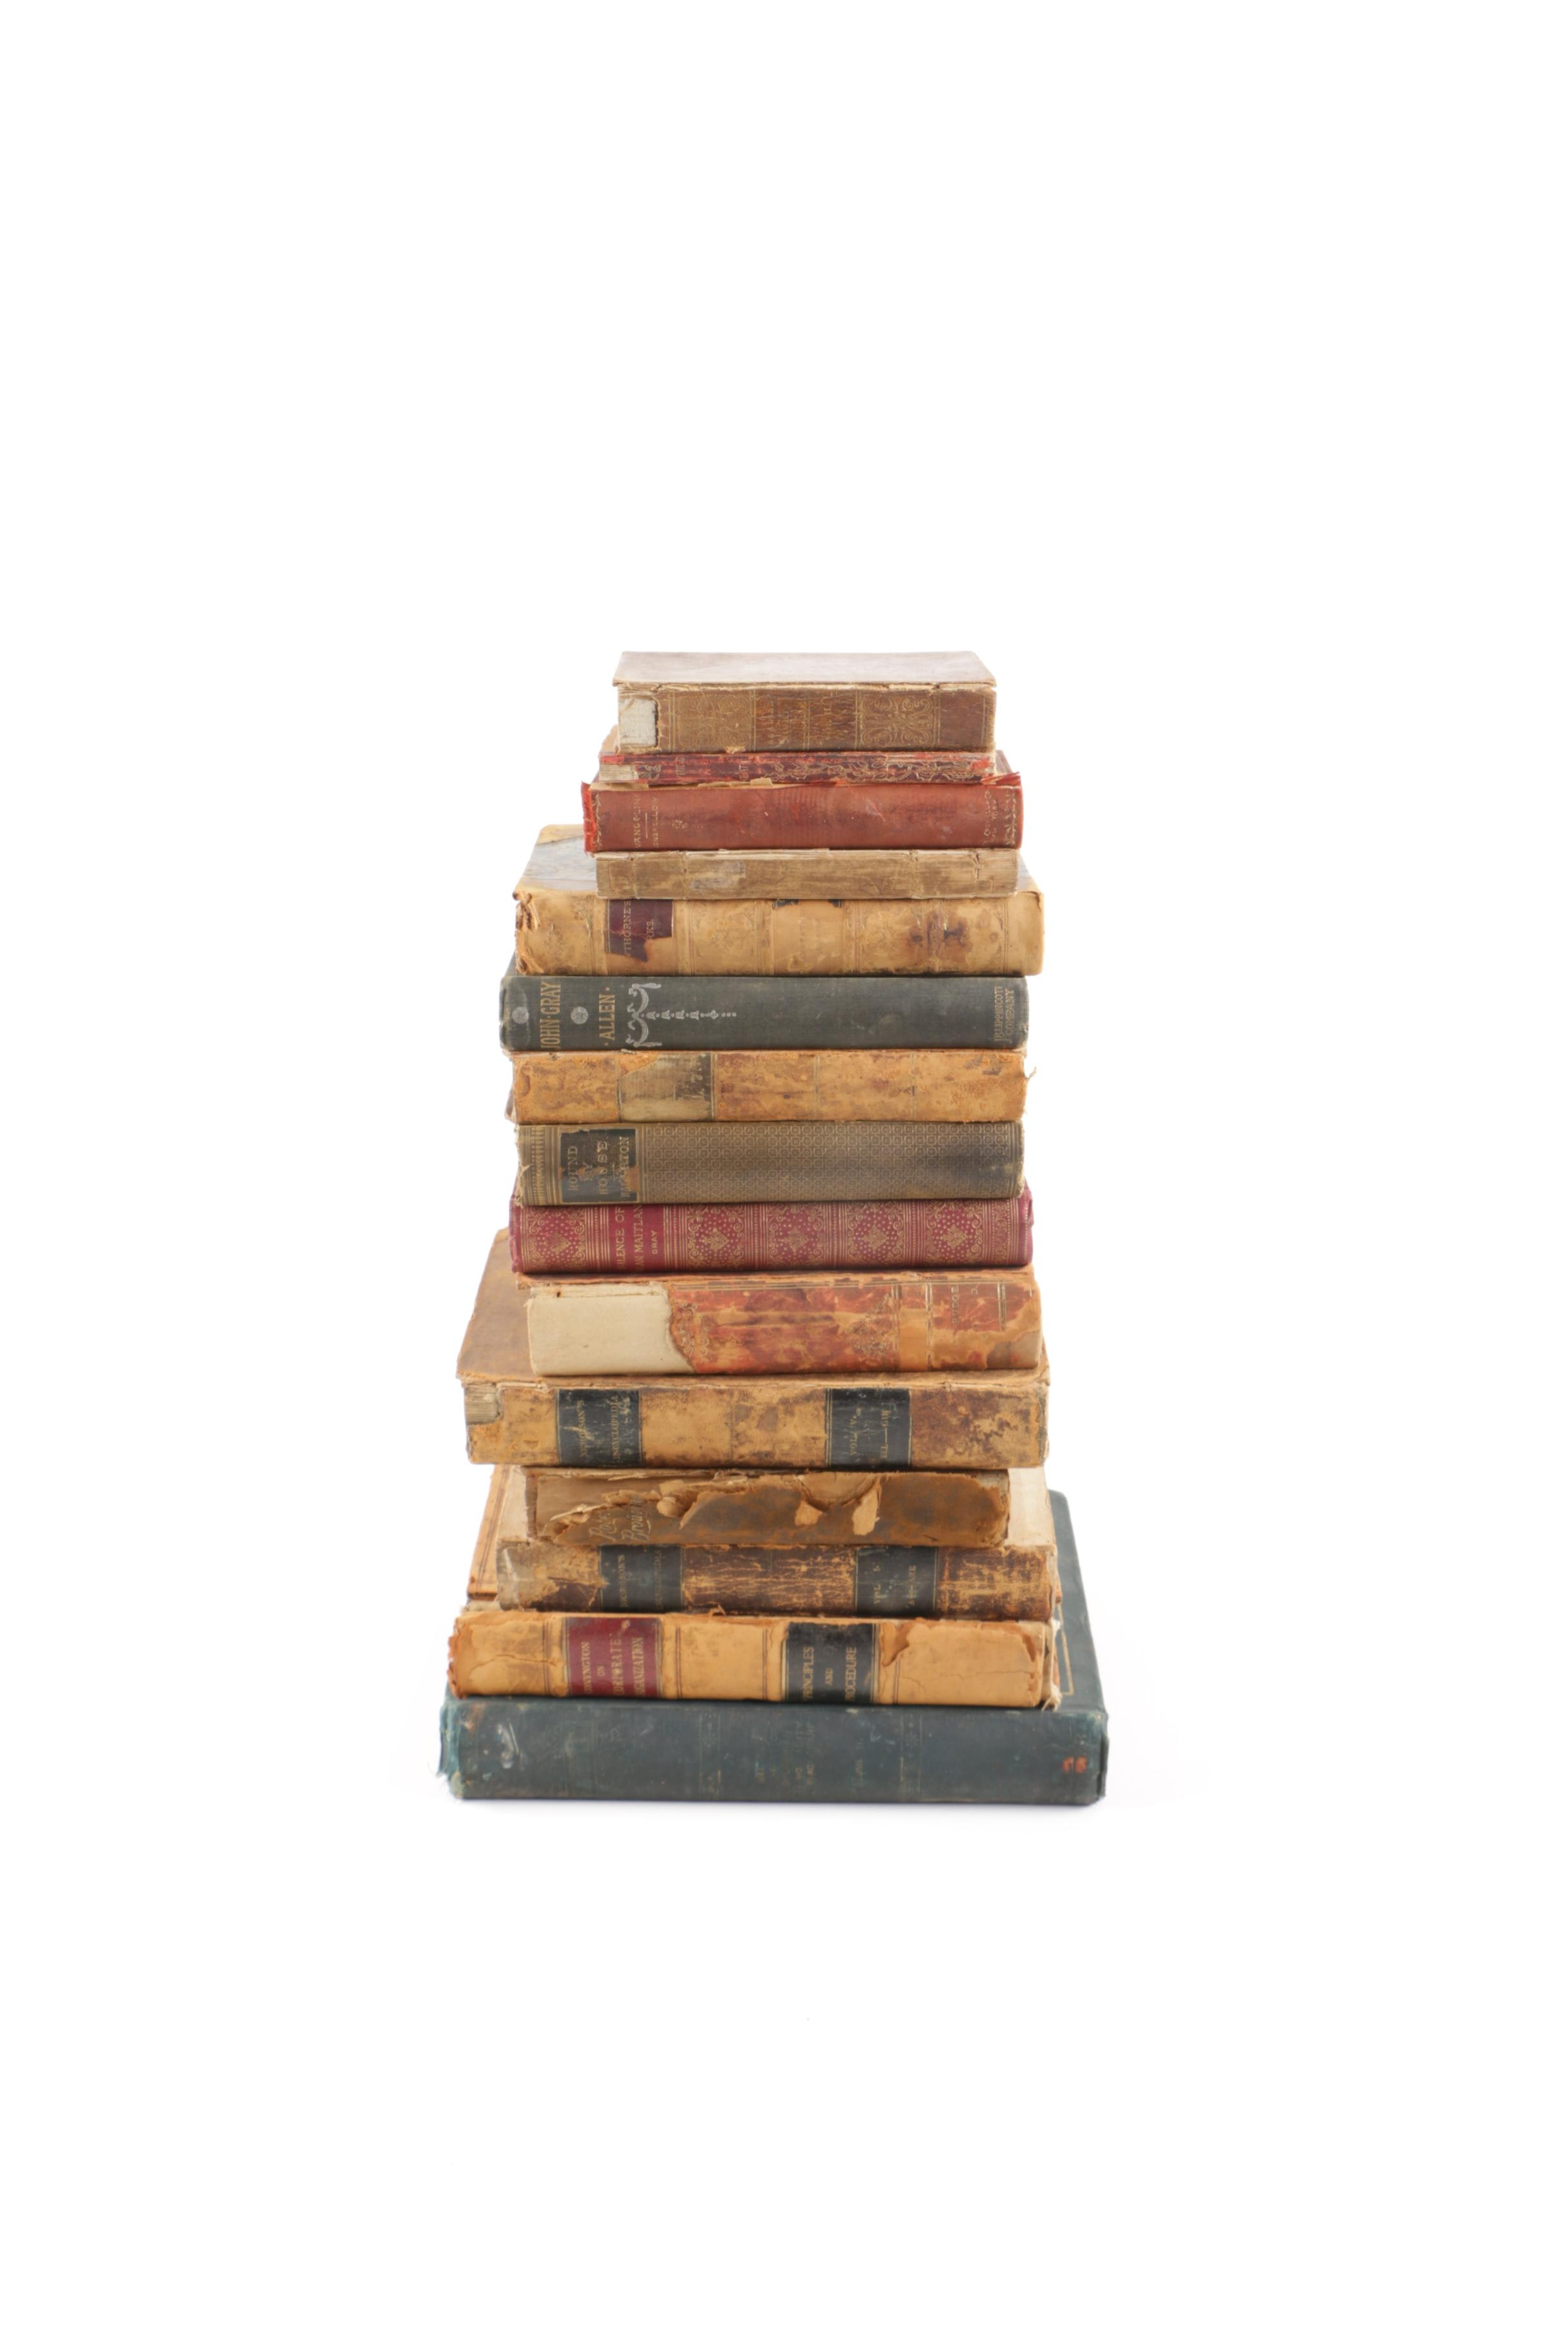 Antique Book Assortment Including 1819 Encyclopedia Volumes